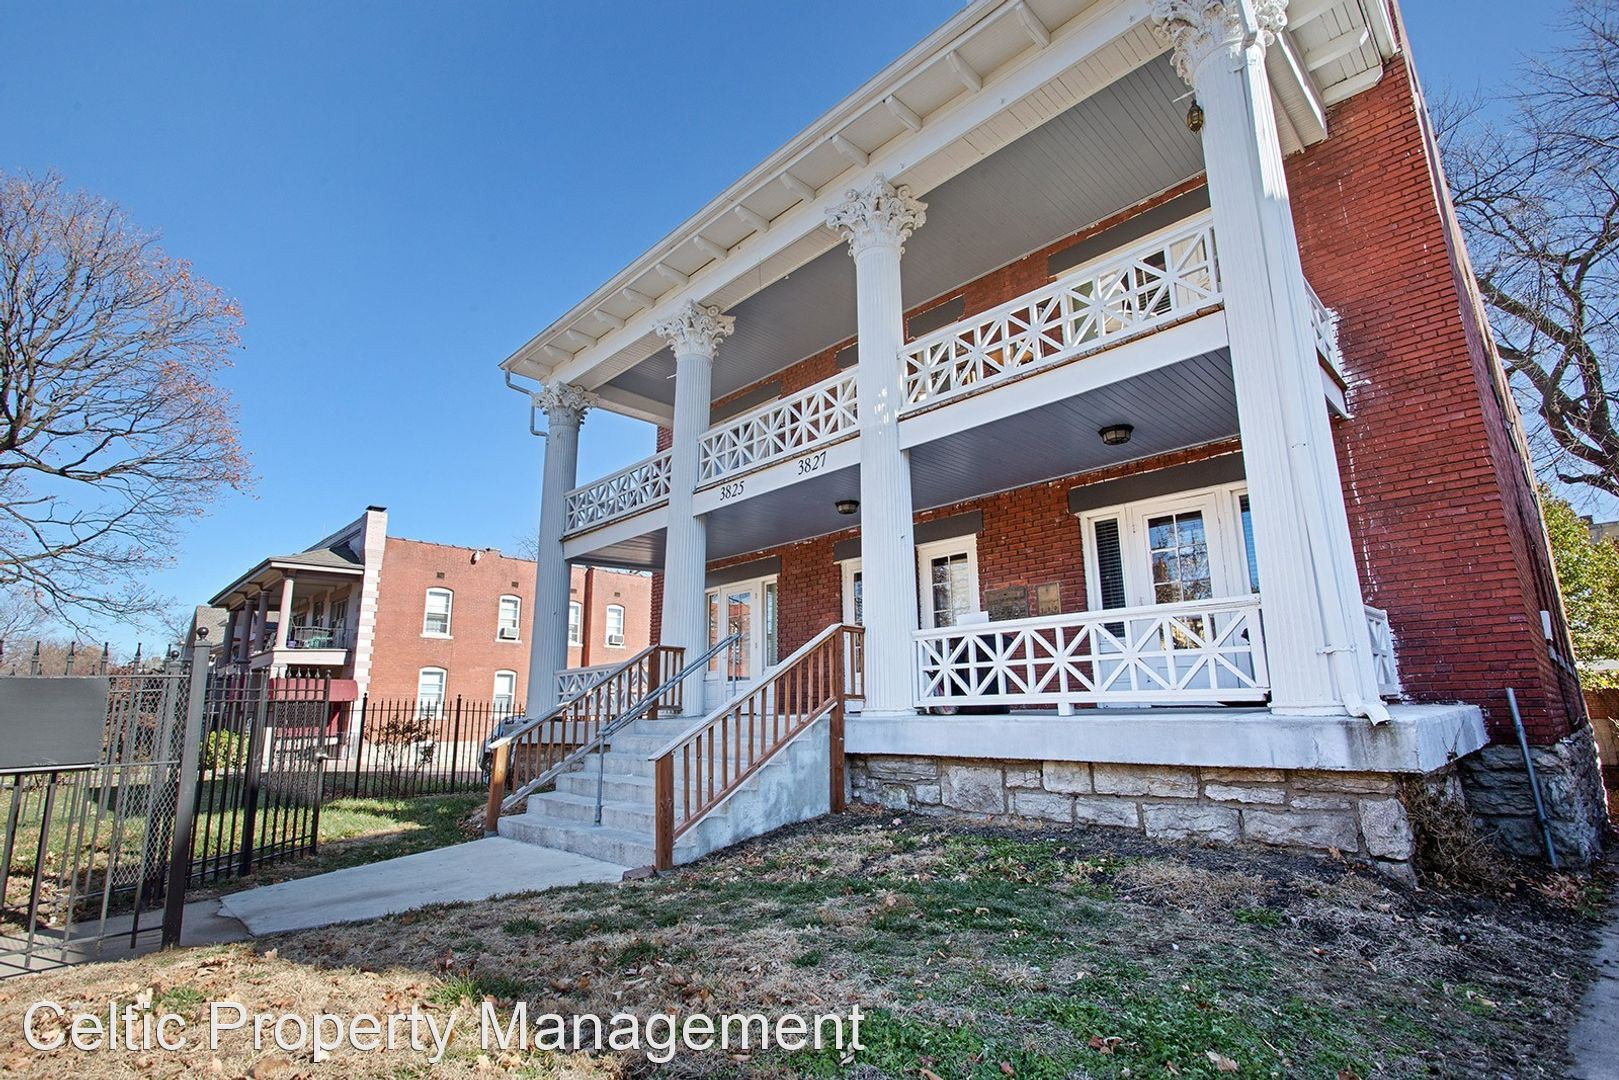 Apartments Near KUMC 3825 Baltimore Apartments for University of Kansas Medical Center Students in Kansas City, KS